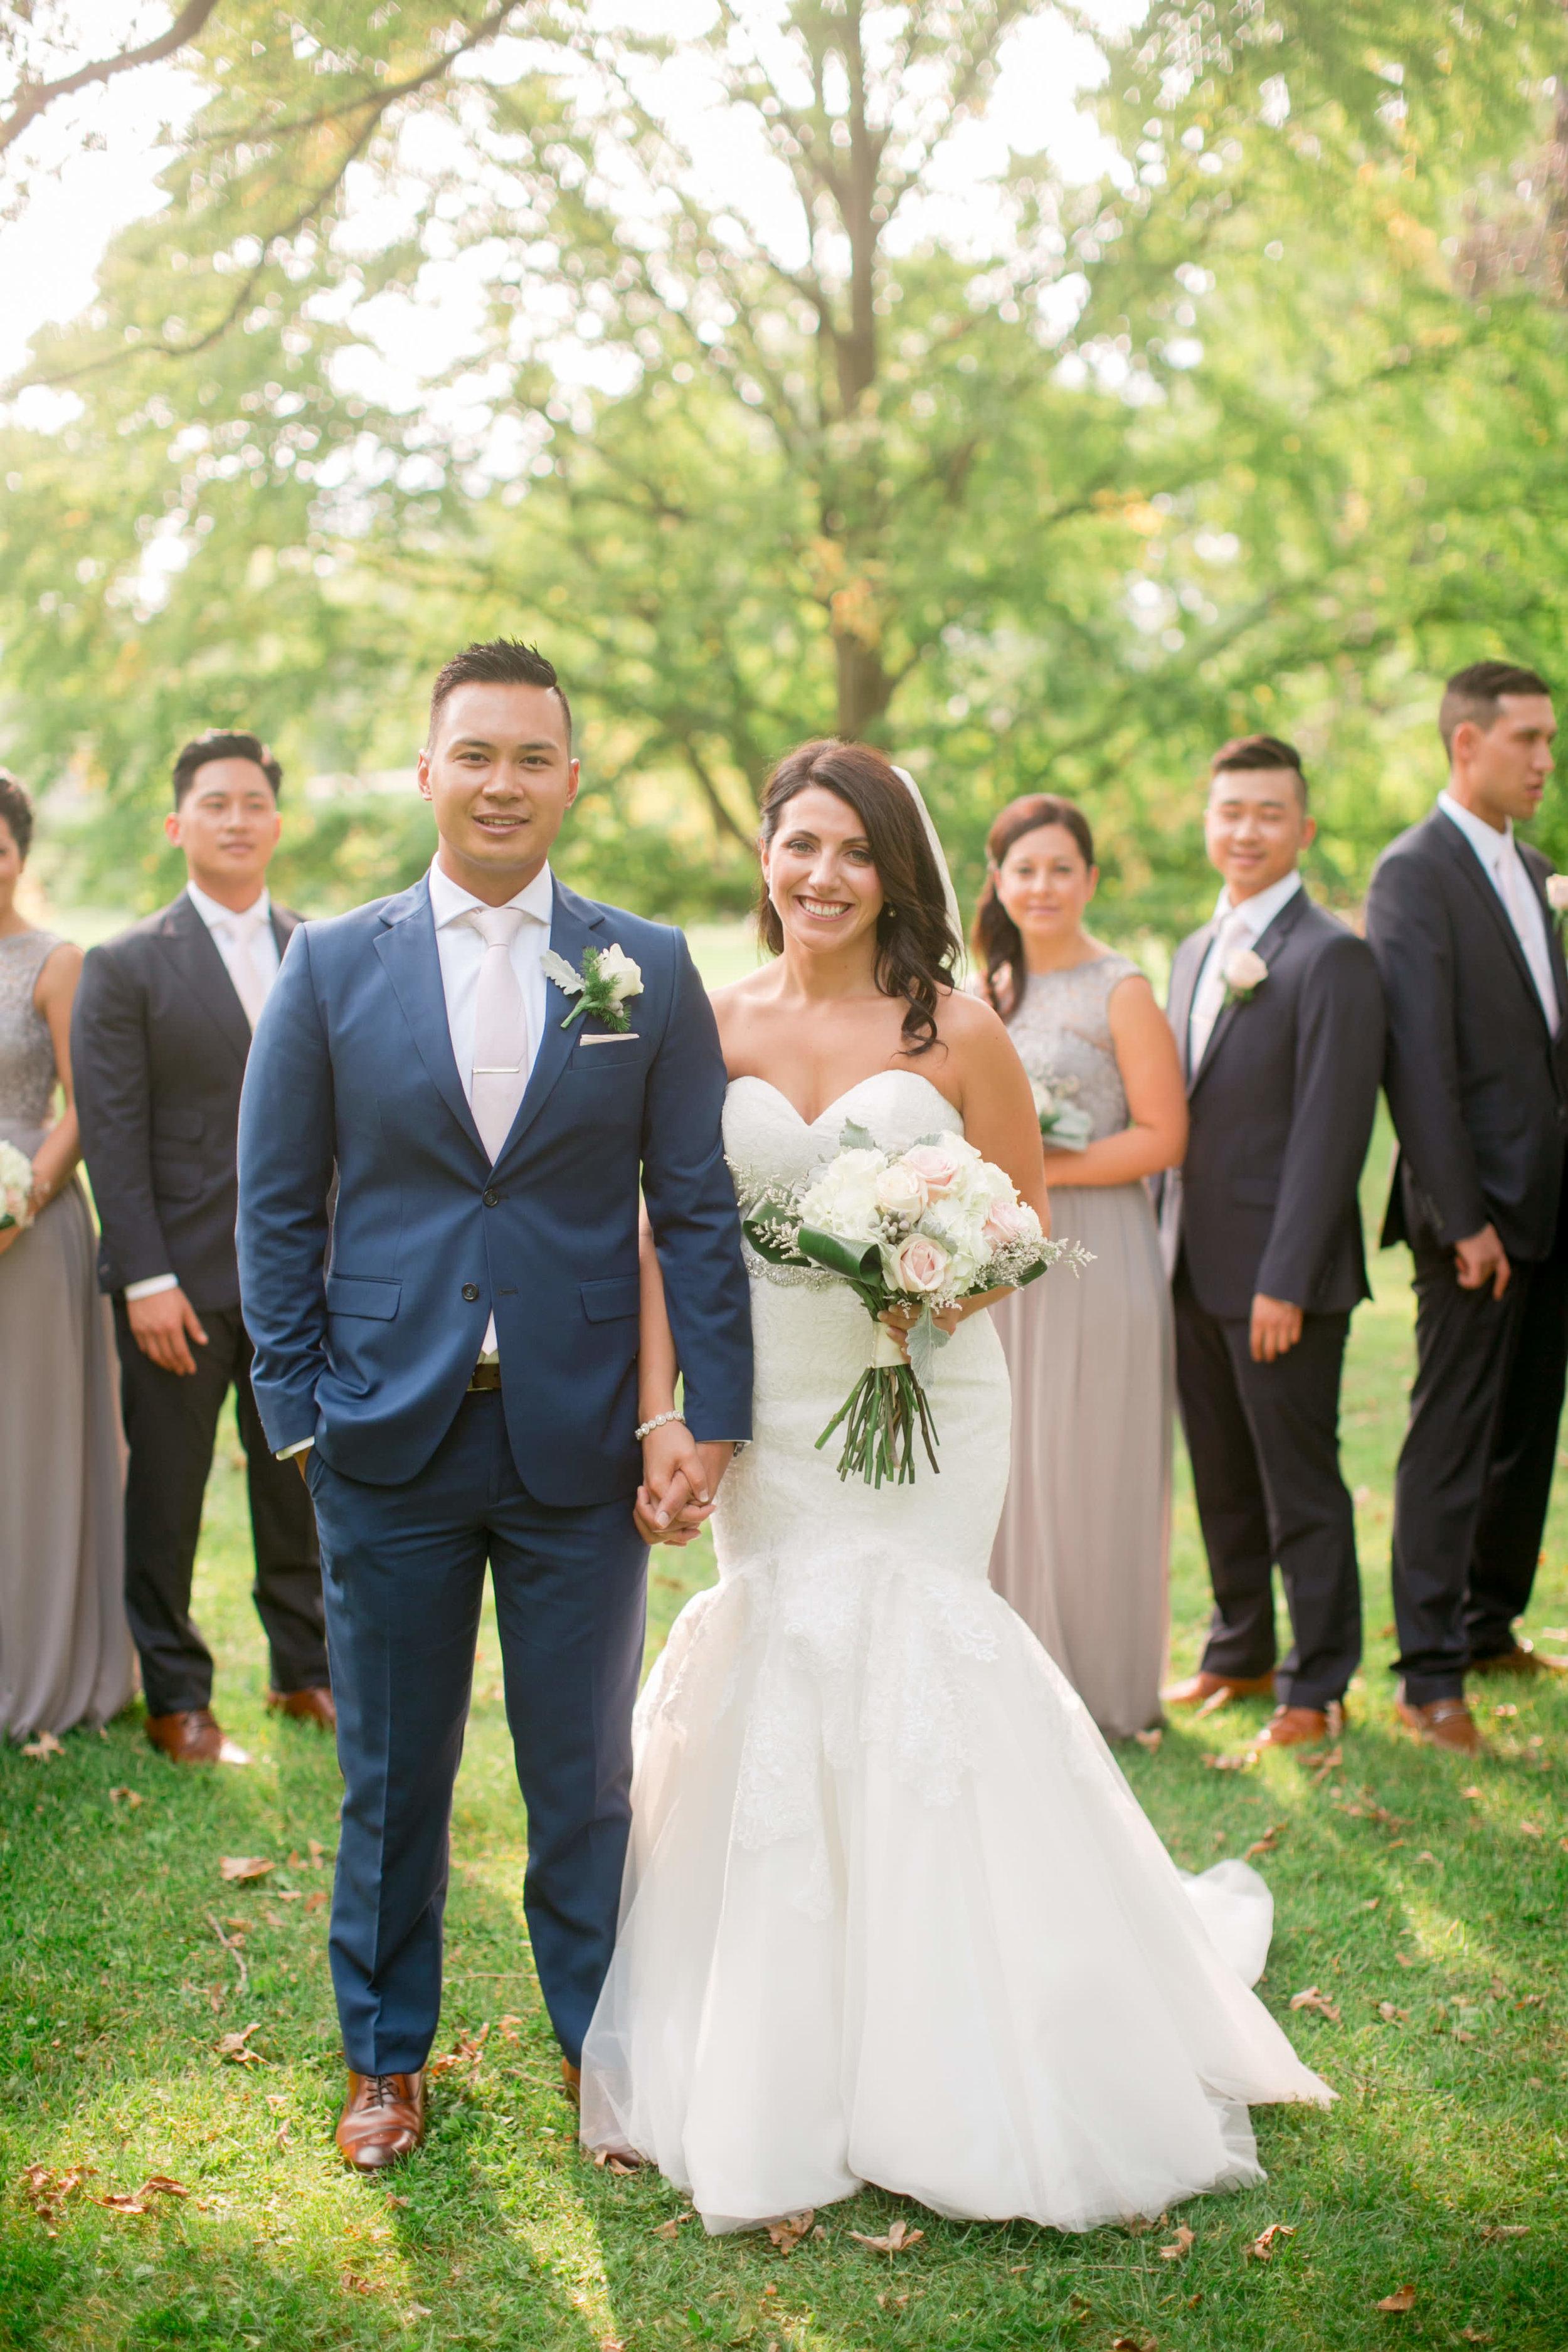 Stefanie___Bernard___Daniel_Ricci_Weddings_High_Res._Finals__290.jpg